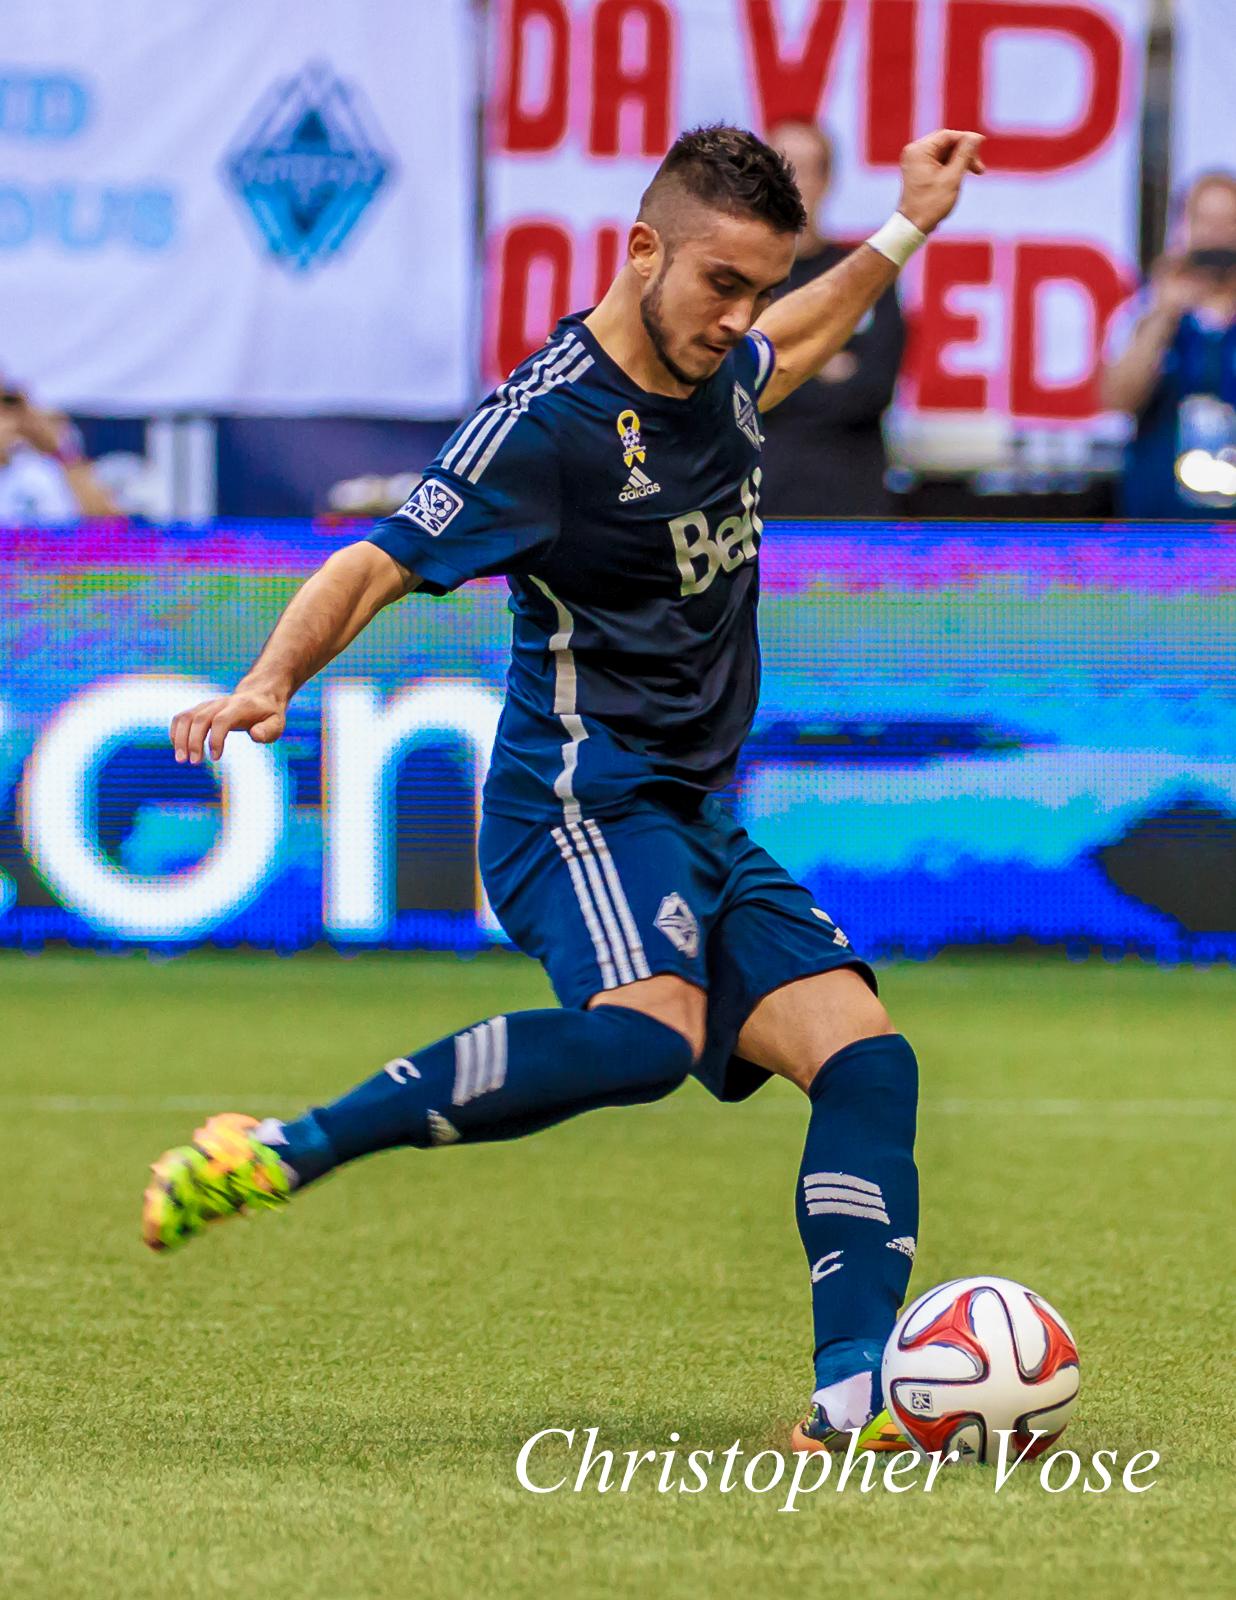 2014-09-27 Pedro Morales' First Penalty Kick.jpg